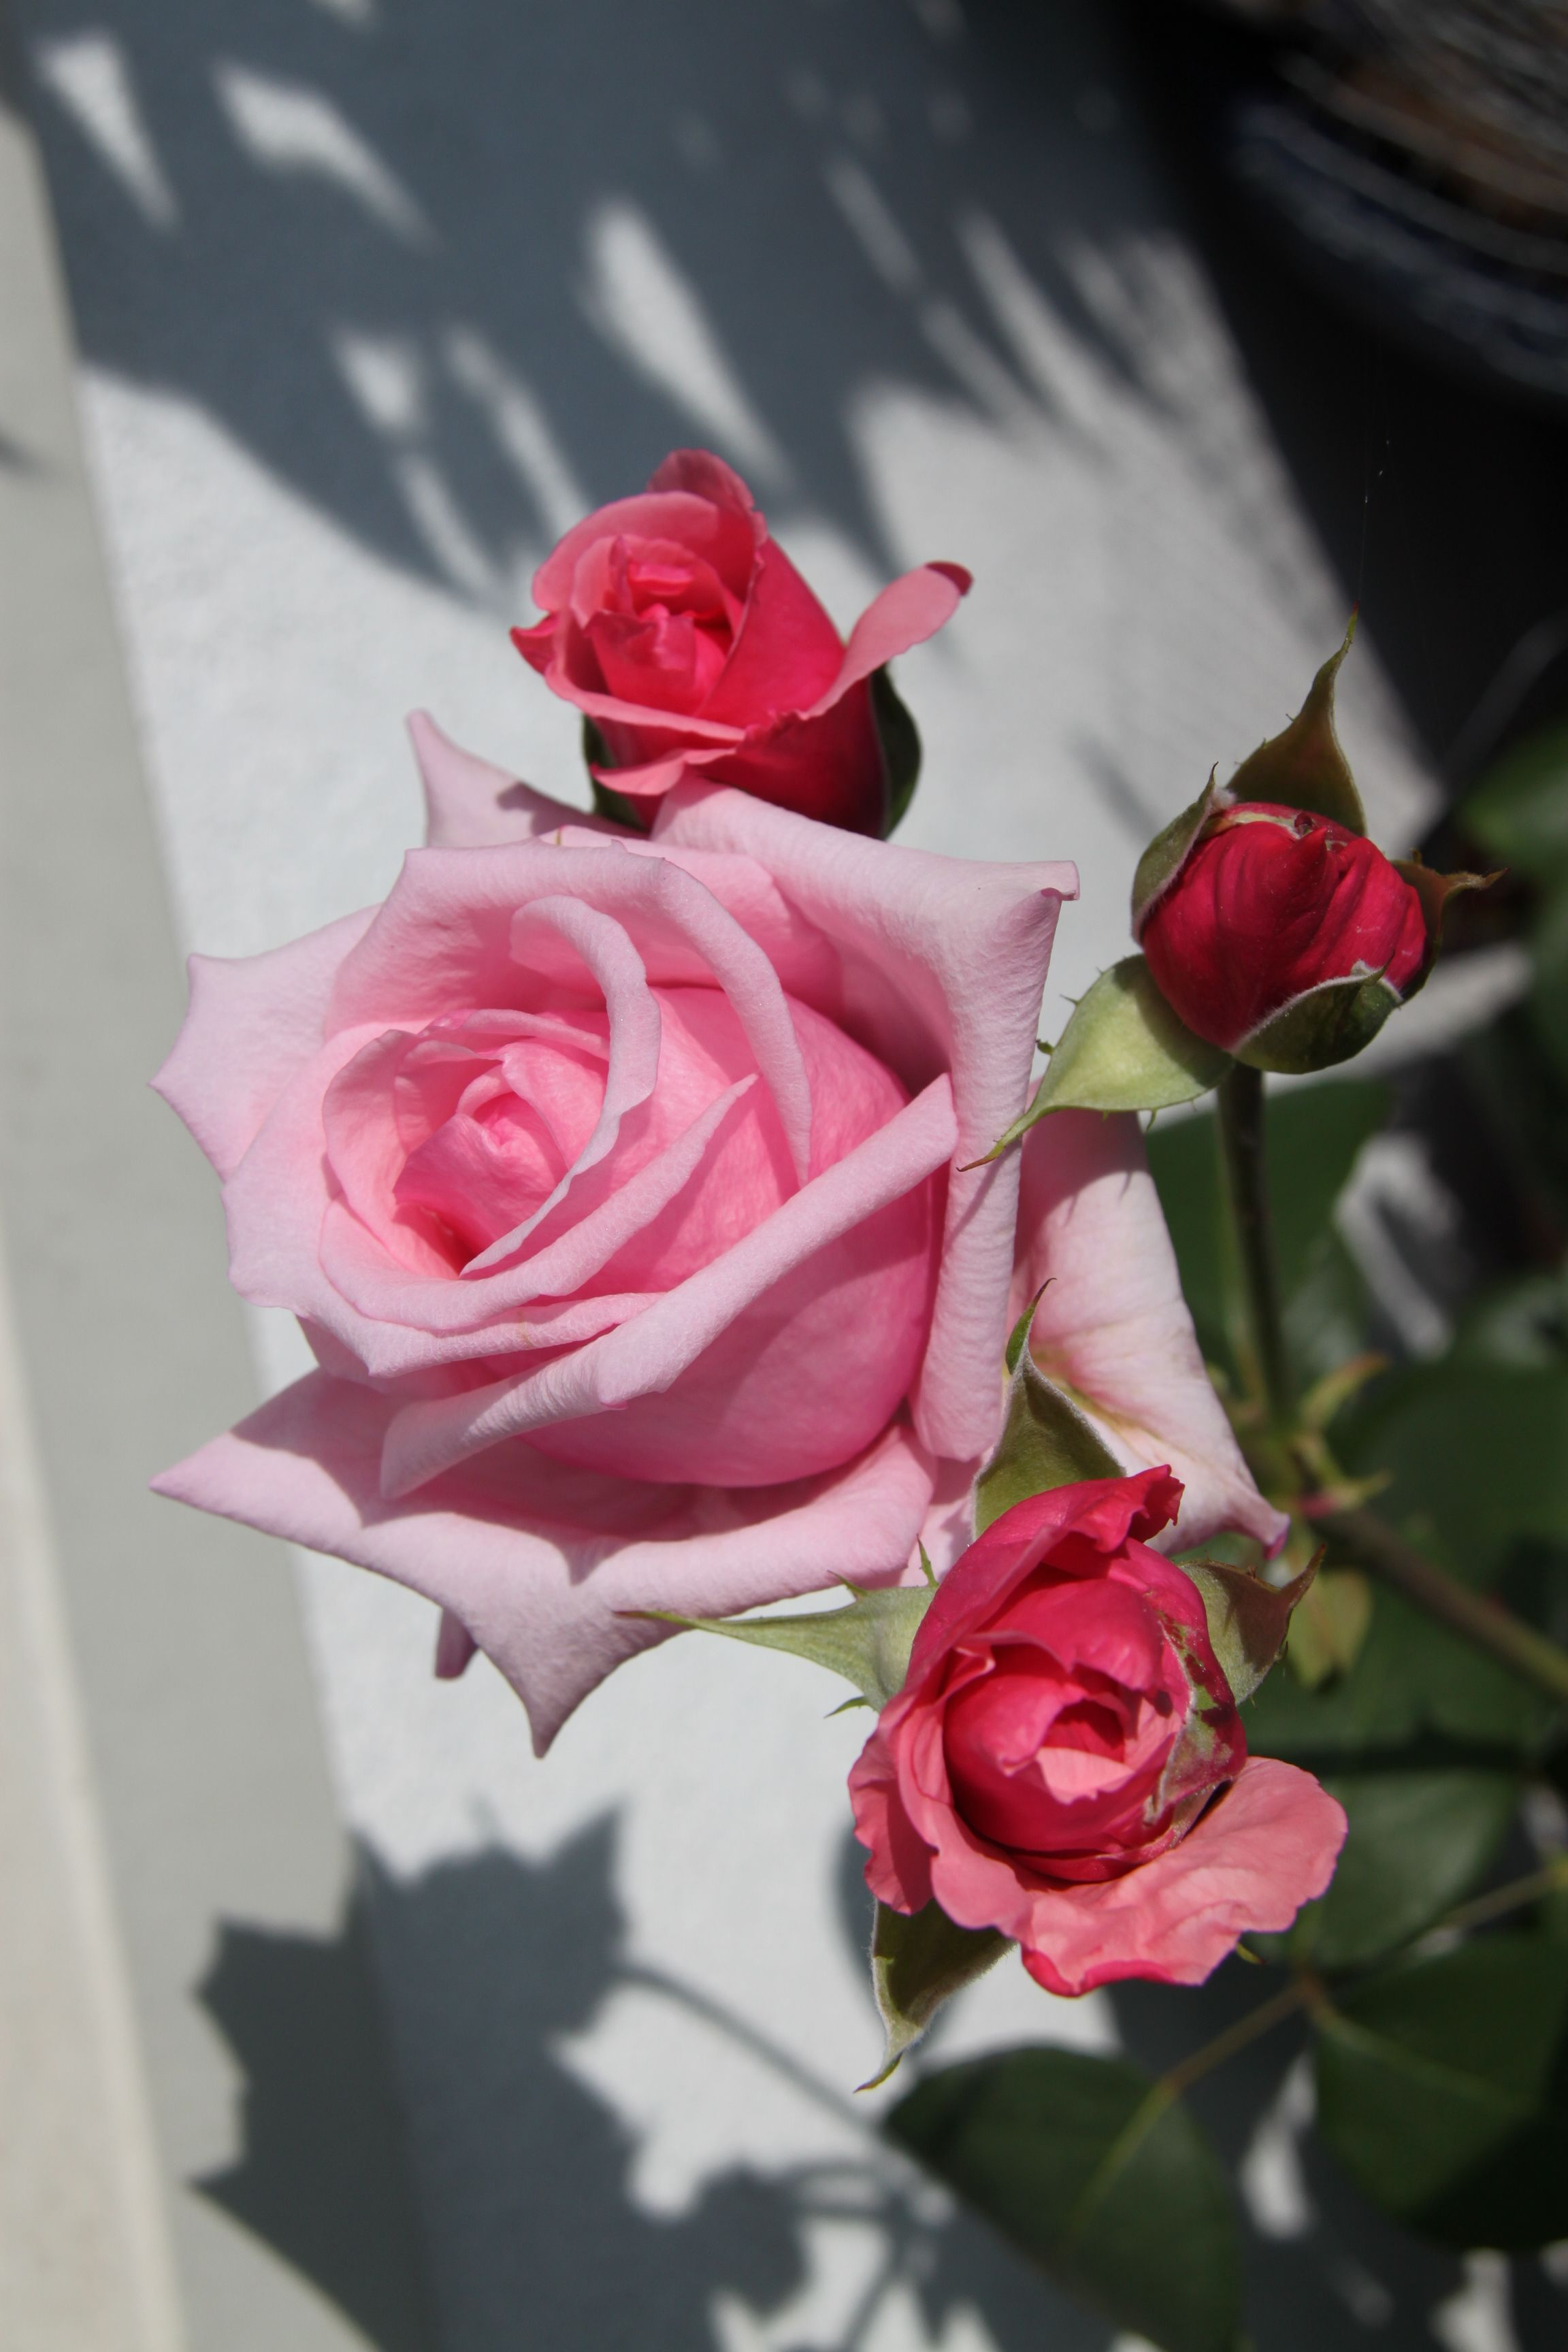 ❤ I love Roses